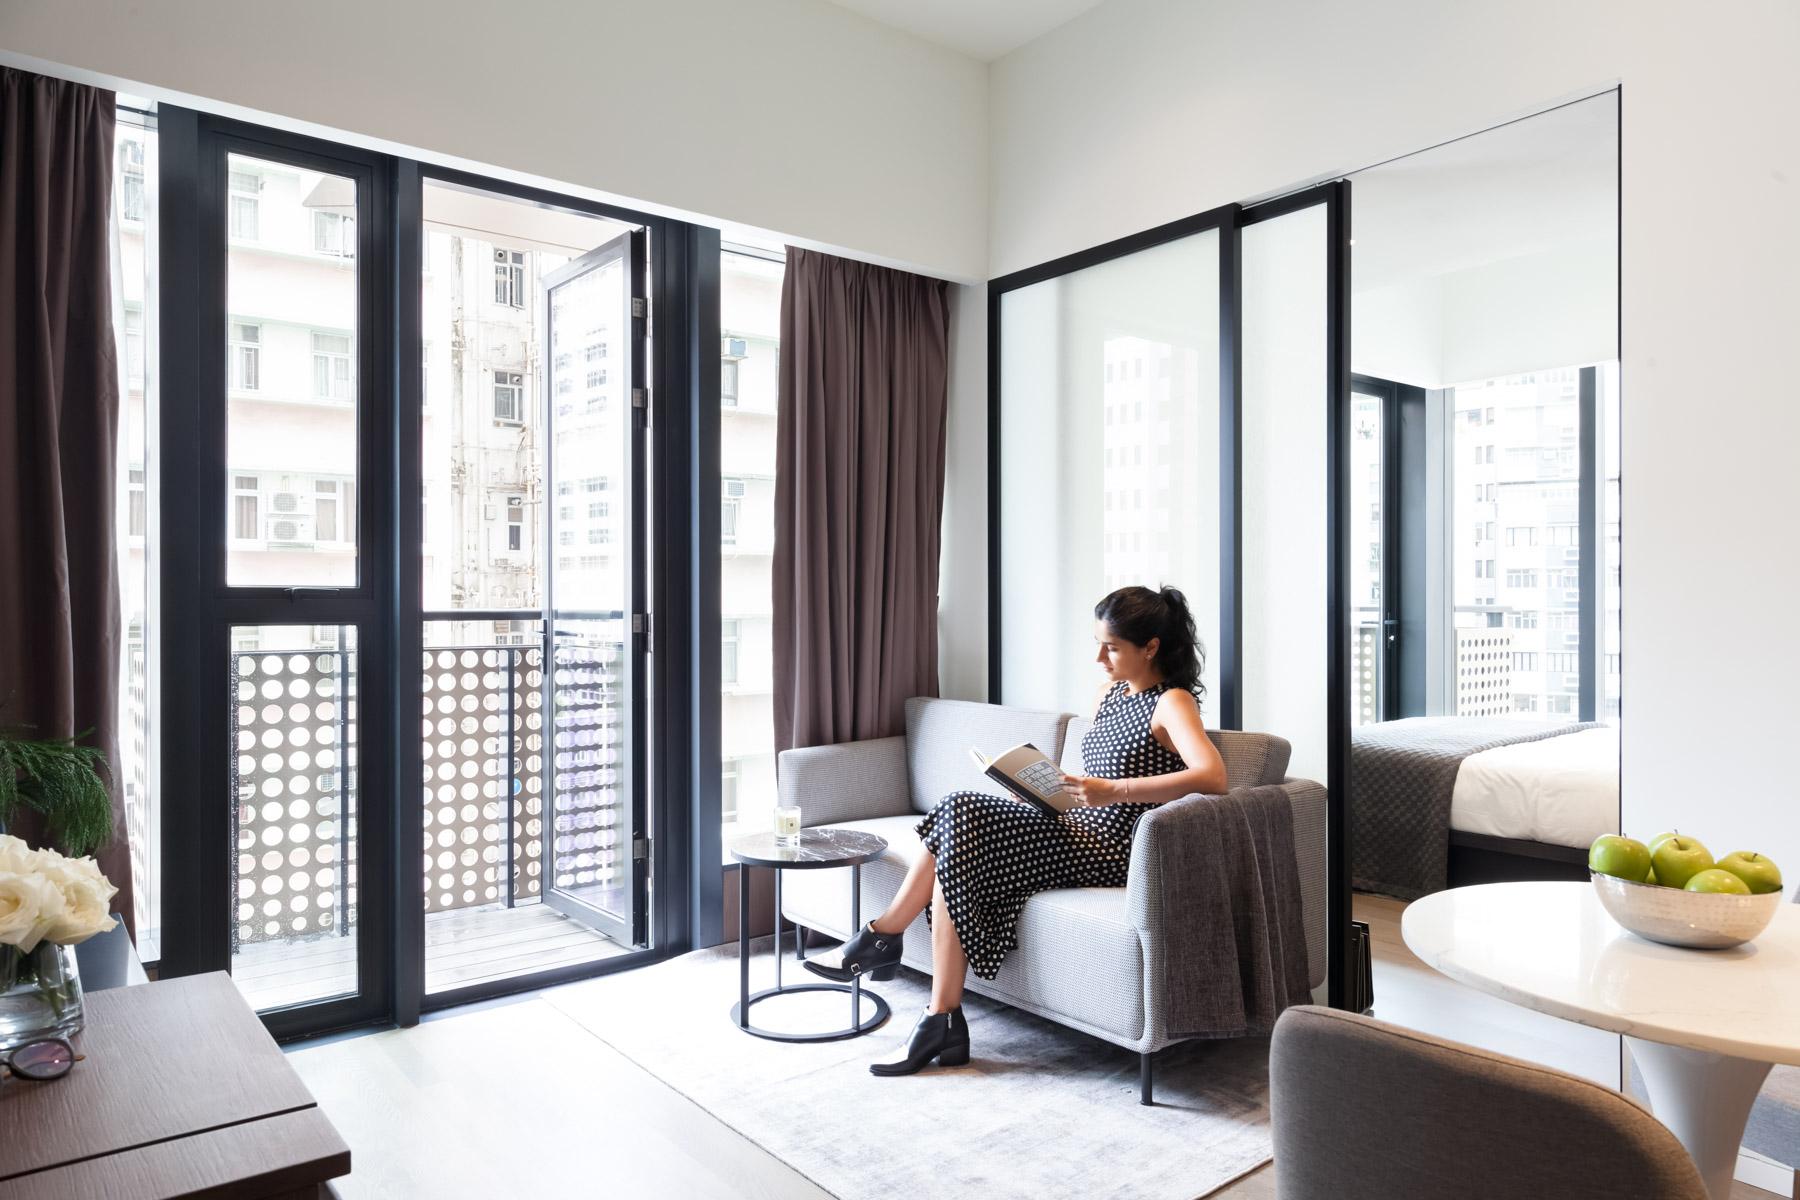 Anahita Chouhan Make Architects Luna_JM08_Studio Flat C-0219_WebRes.jpg